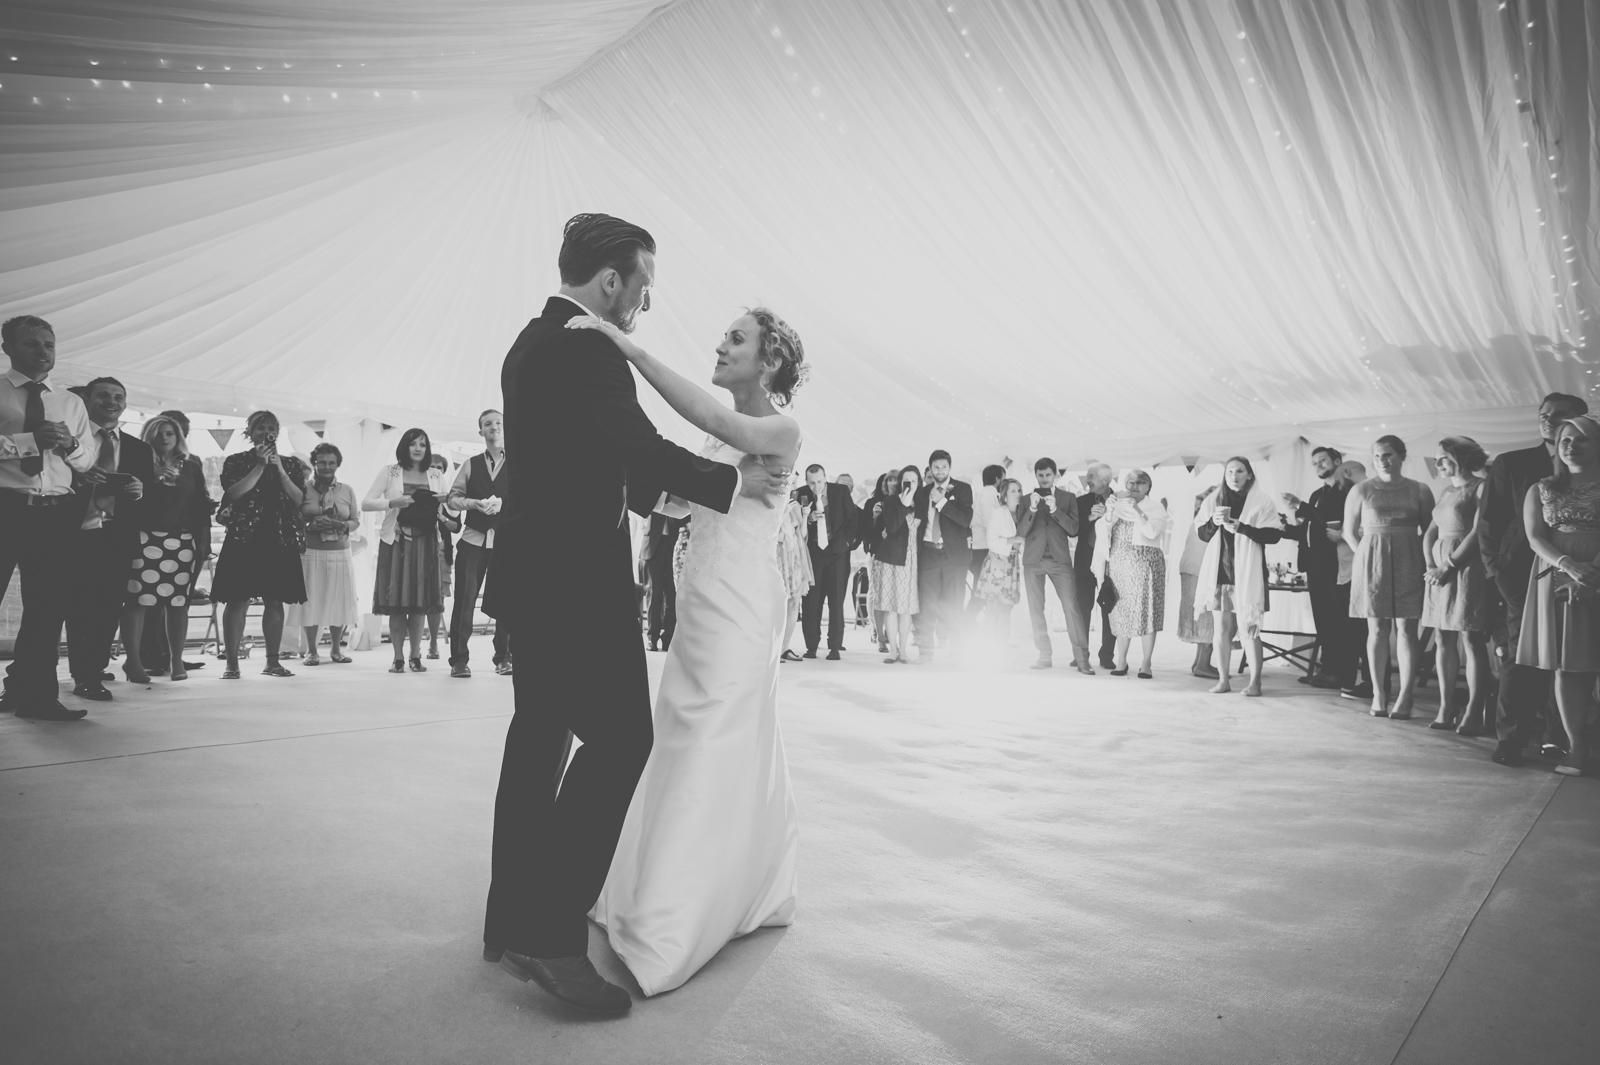 wedding-photography-rock-175.jpg